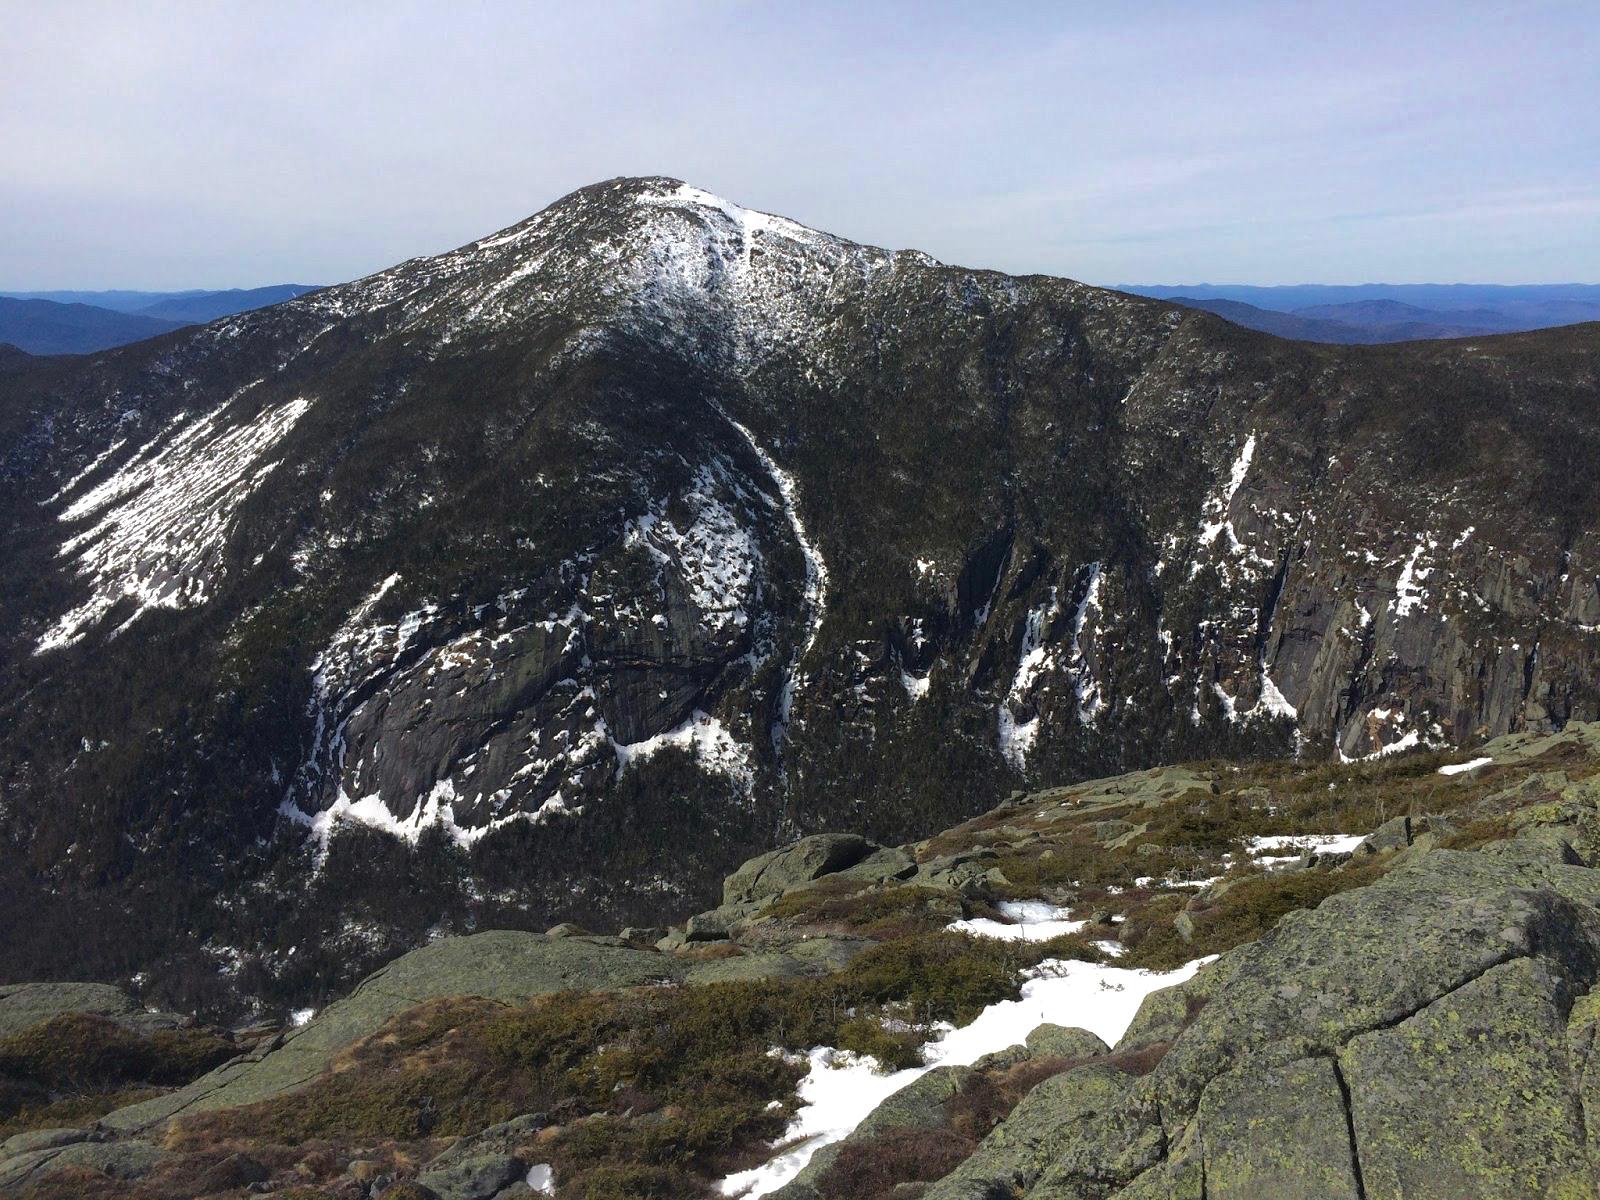 Looking across to Marcy, our final peak, from Haystack, our penultimate peak